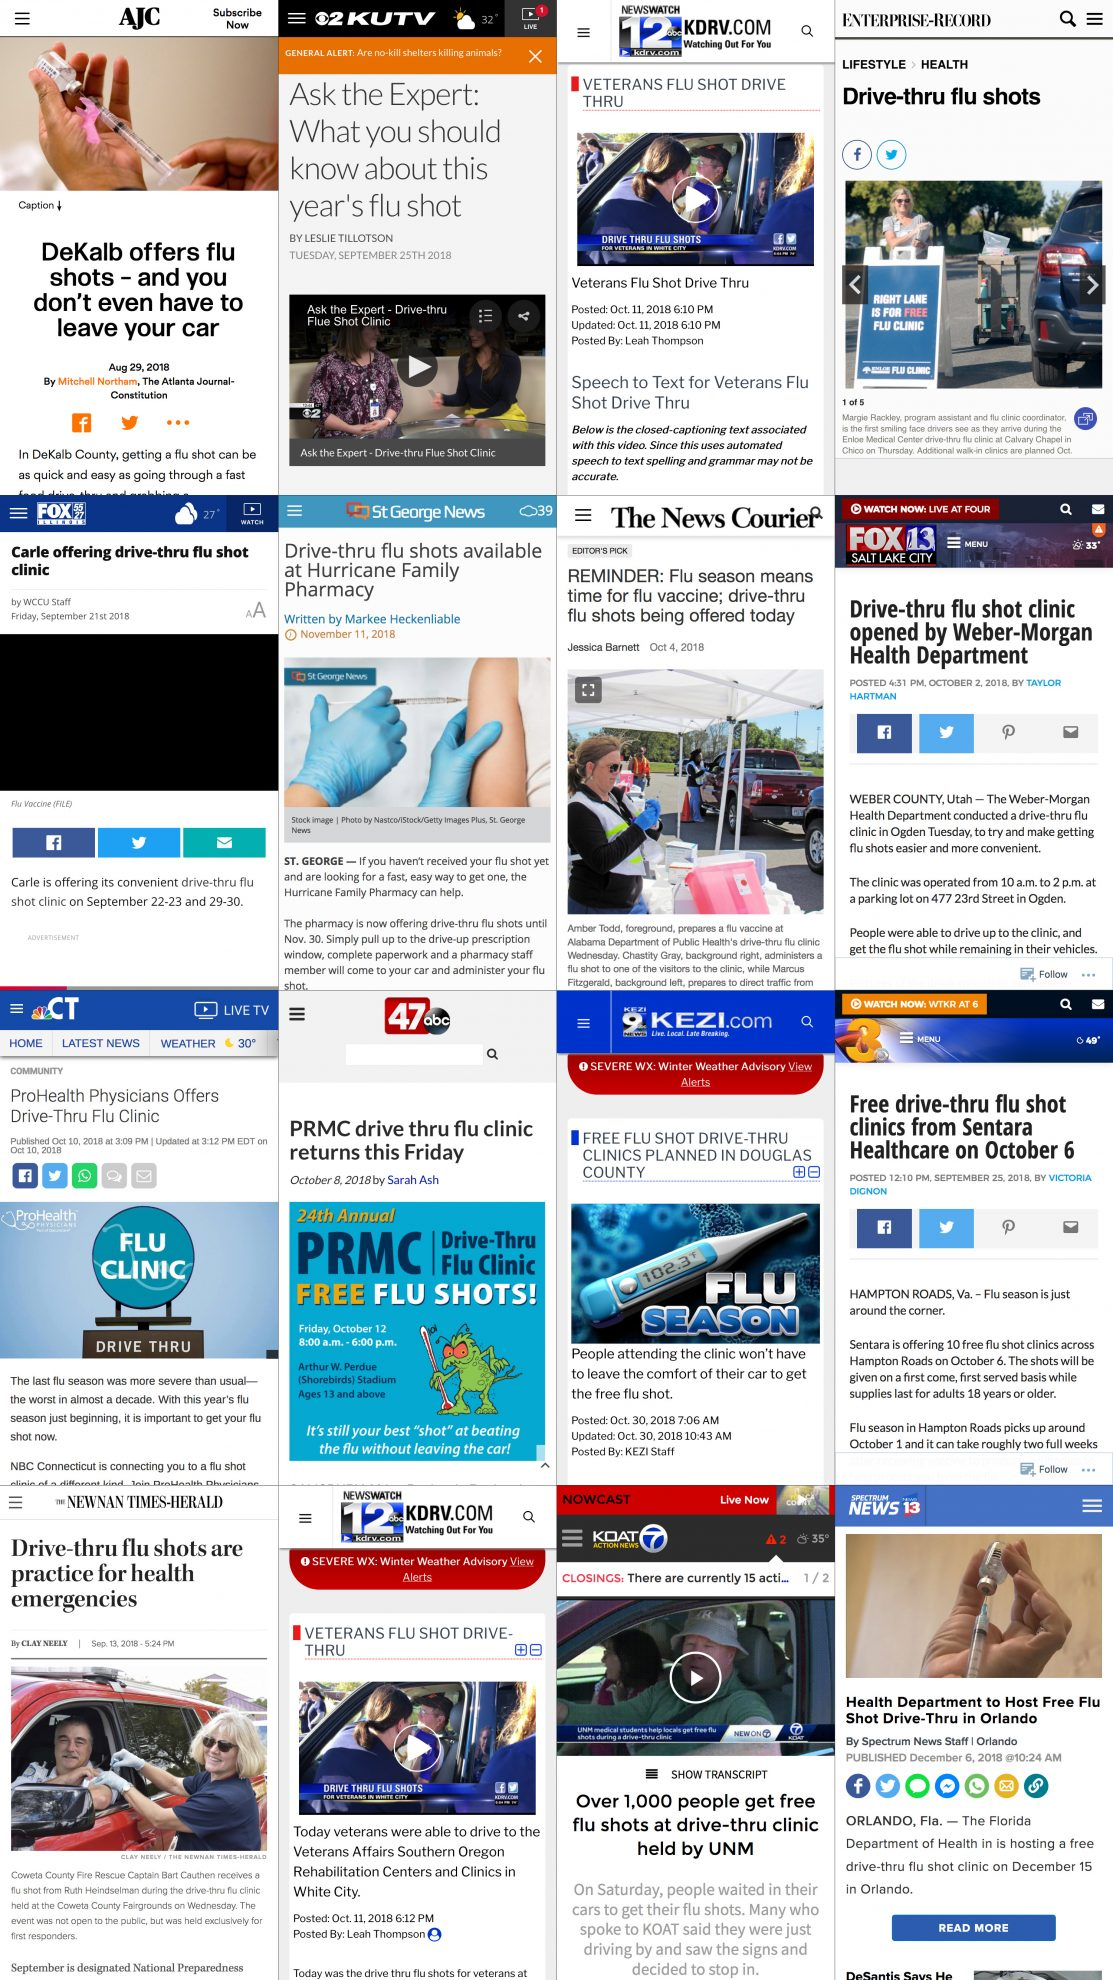 Drive Thru Flu Shot News Headline Montage